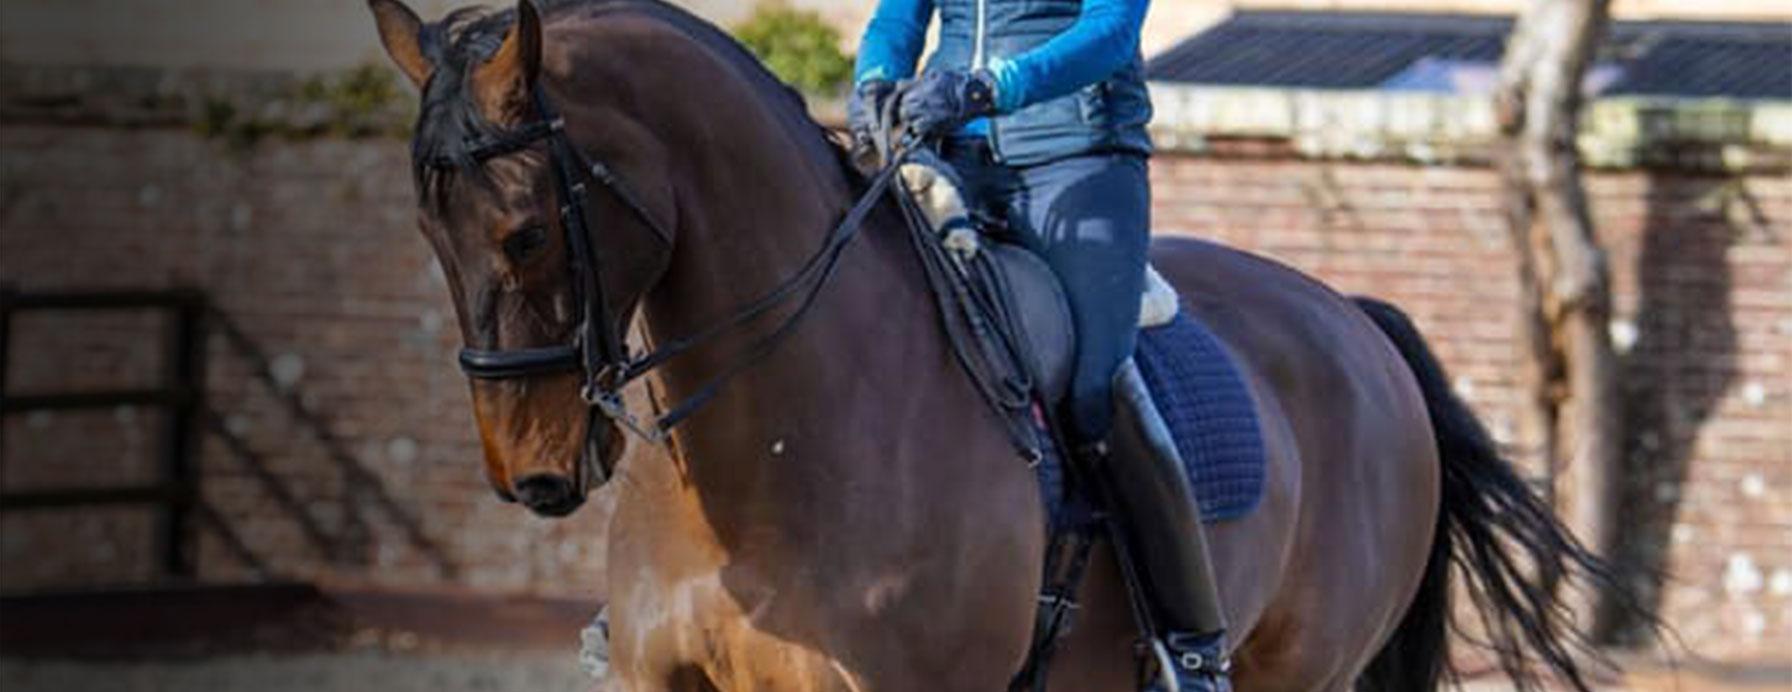 Crosby saddles